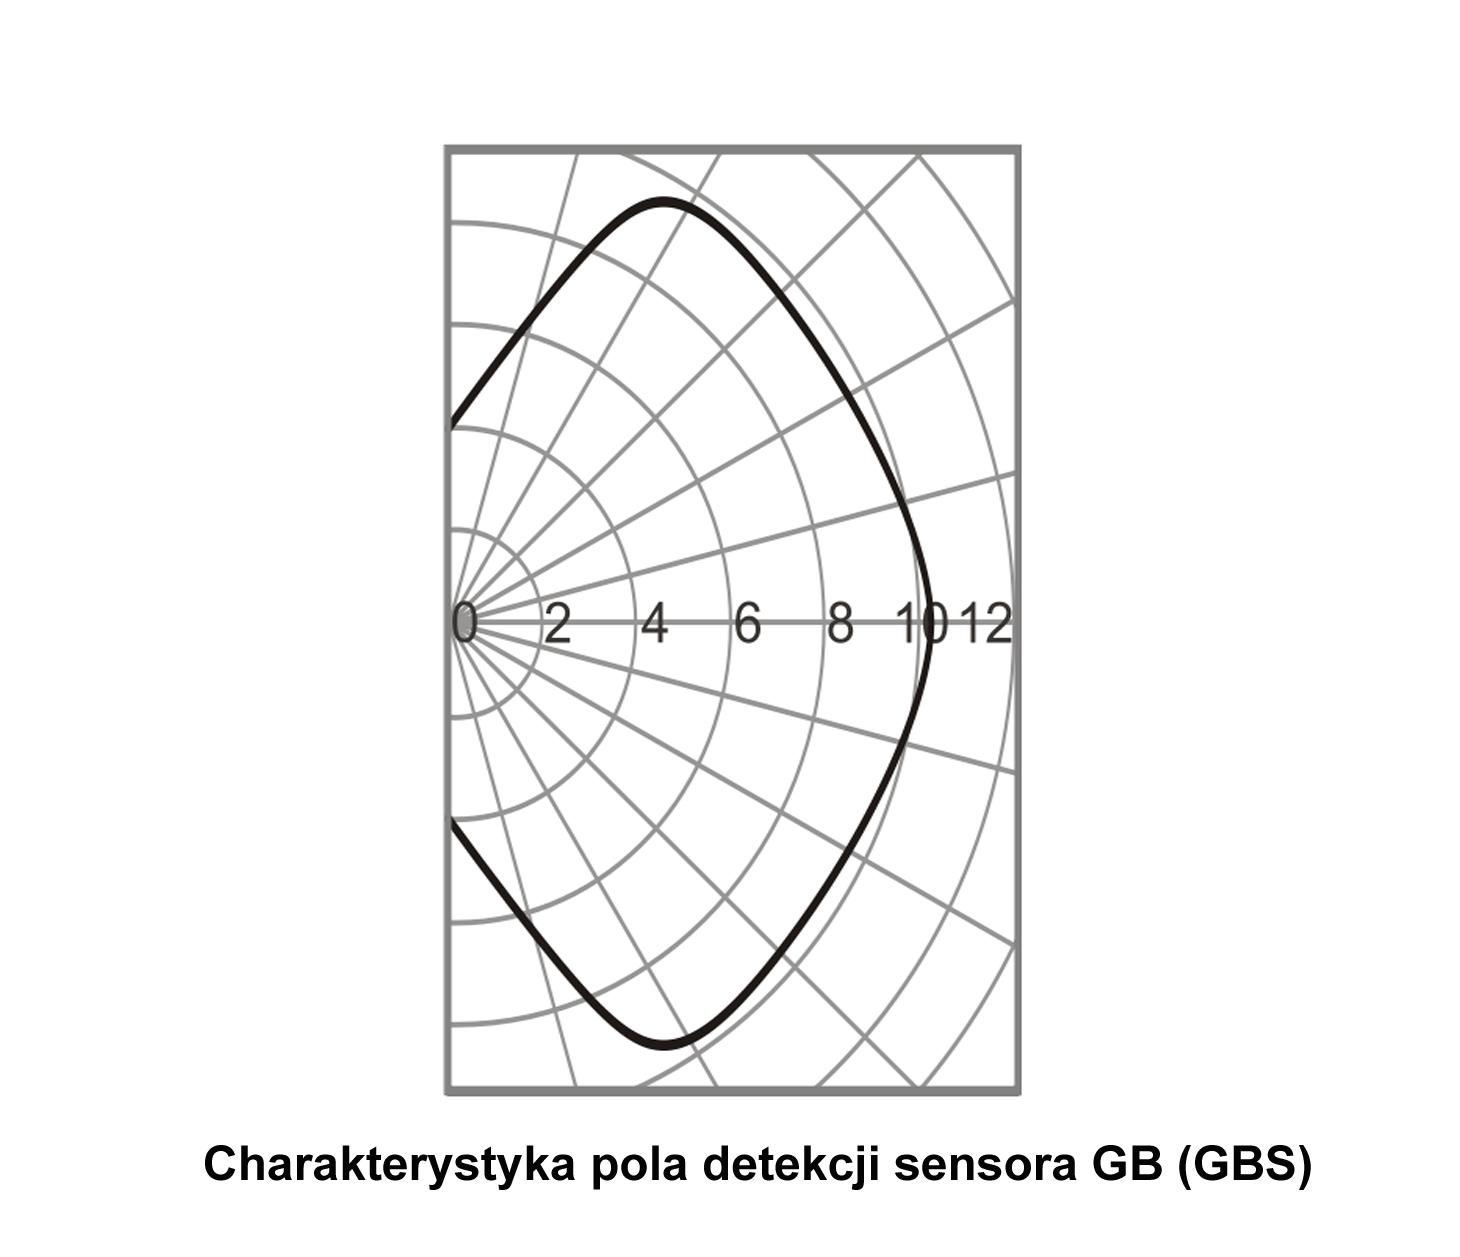 JA110B - Czujnik GB (BUS) charakterystyka detekcji.